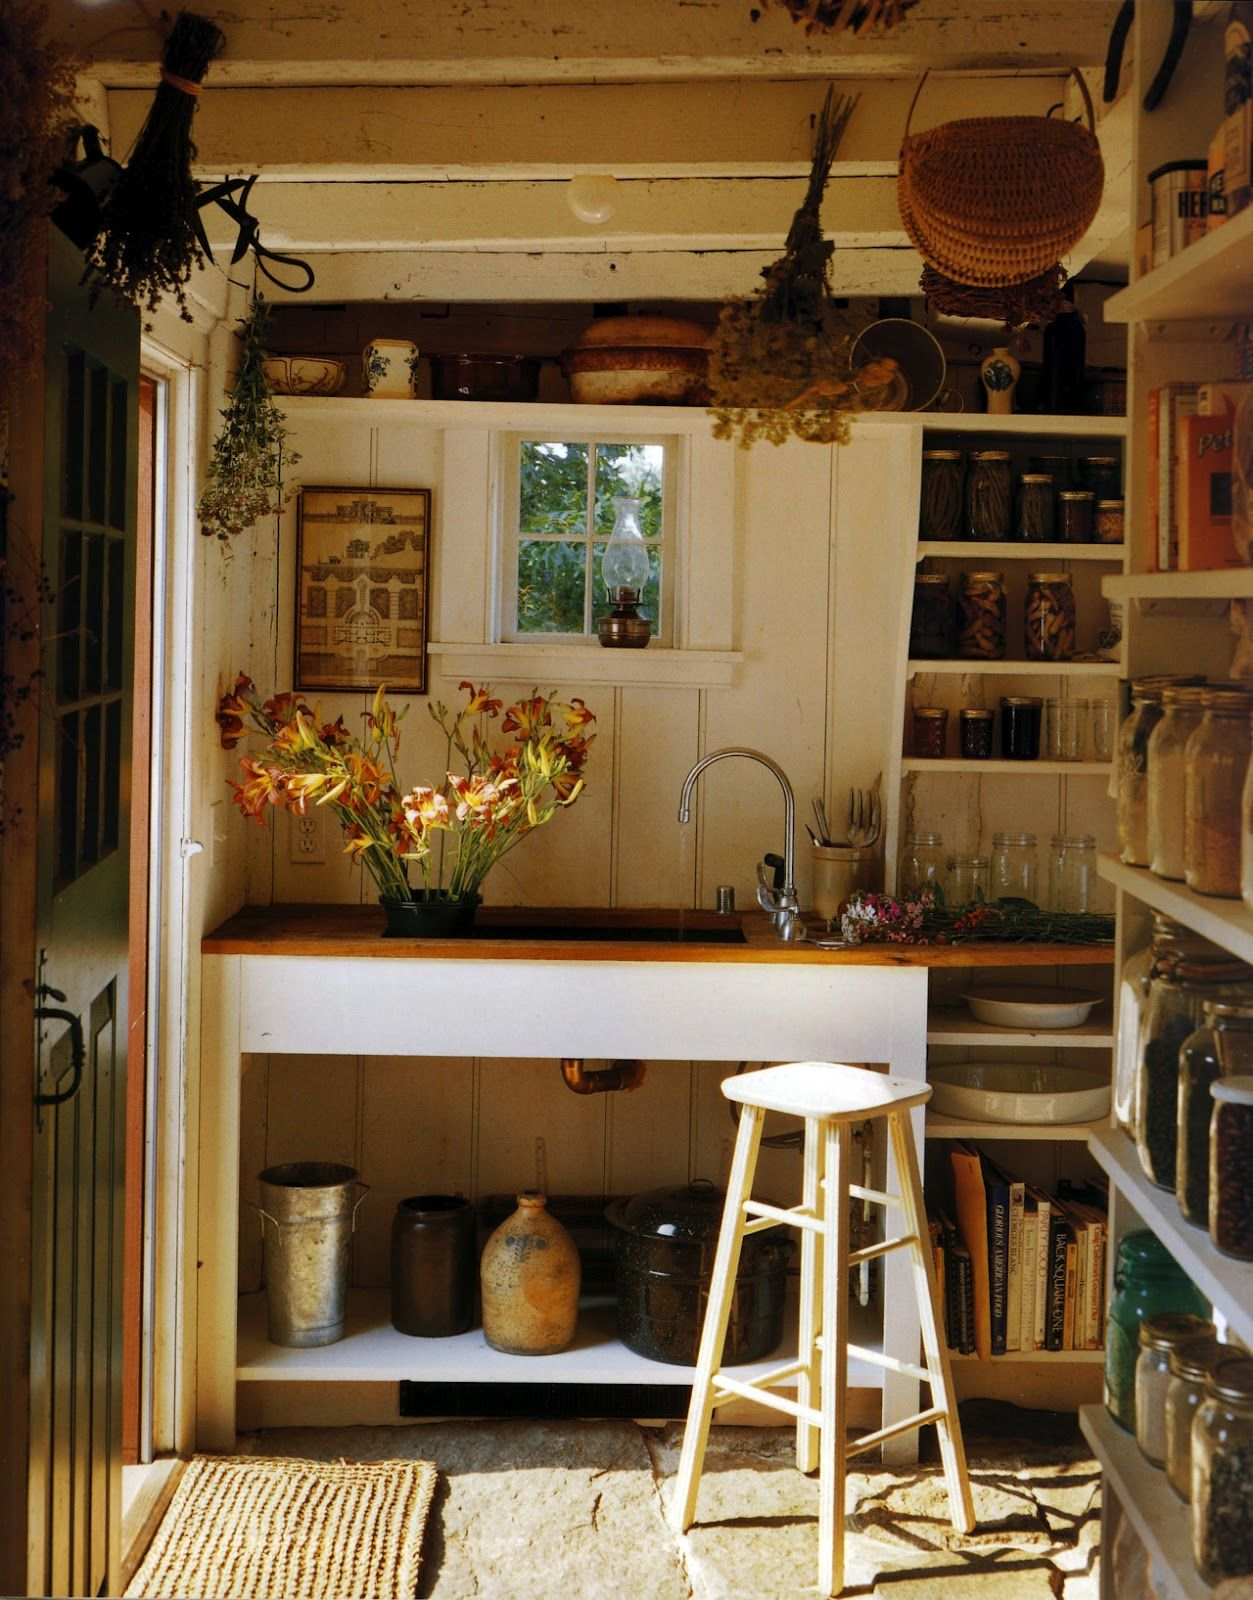 French rustic kitchen - French Rustic Kitchen